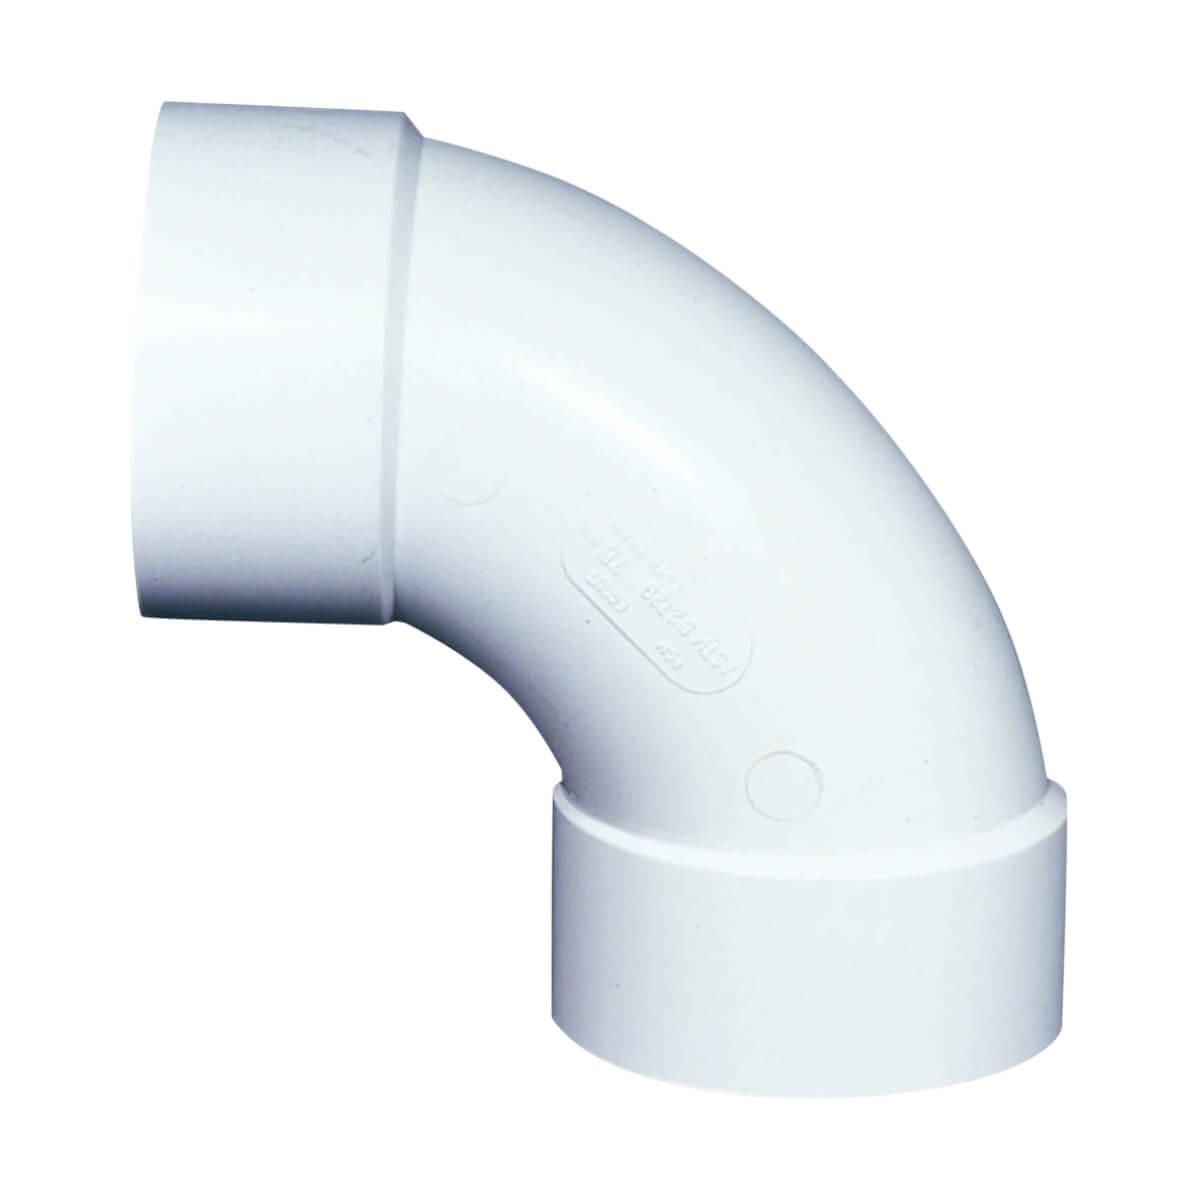 PVC-BDS 90° Elbow - Hub - 4-in